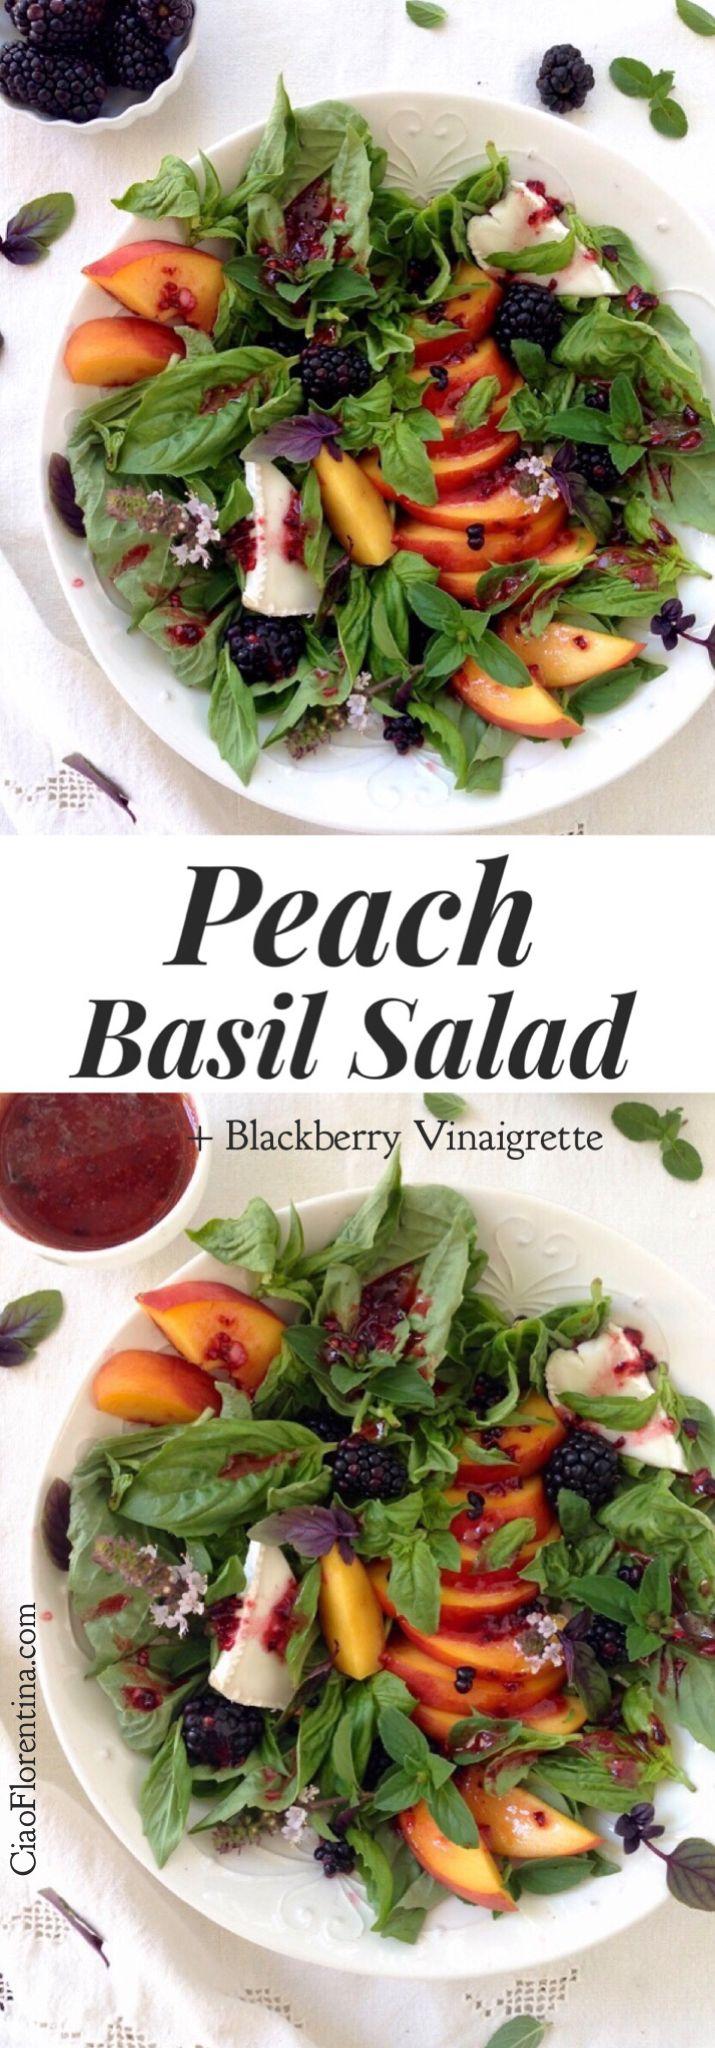 Peach Salad with Basil and Blackberry Vinaigrette Recipe | CiaoFlorentina.com ⭐️⭐️⭐️⭐️⭐️ @CiaoFlorentina